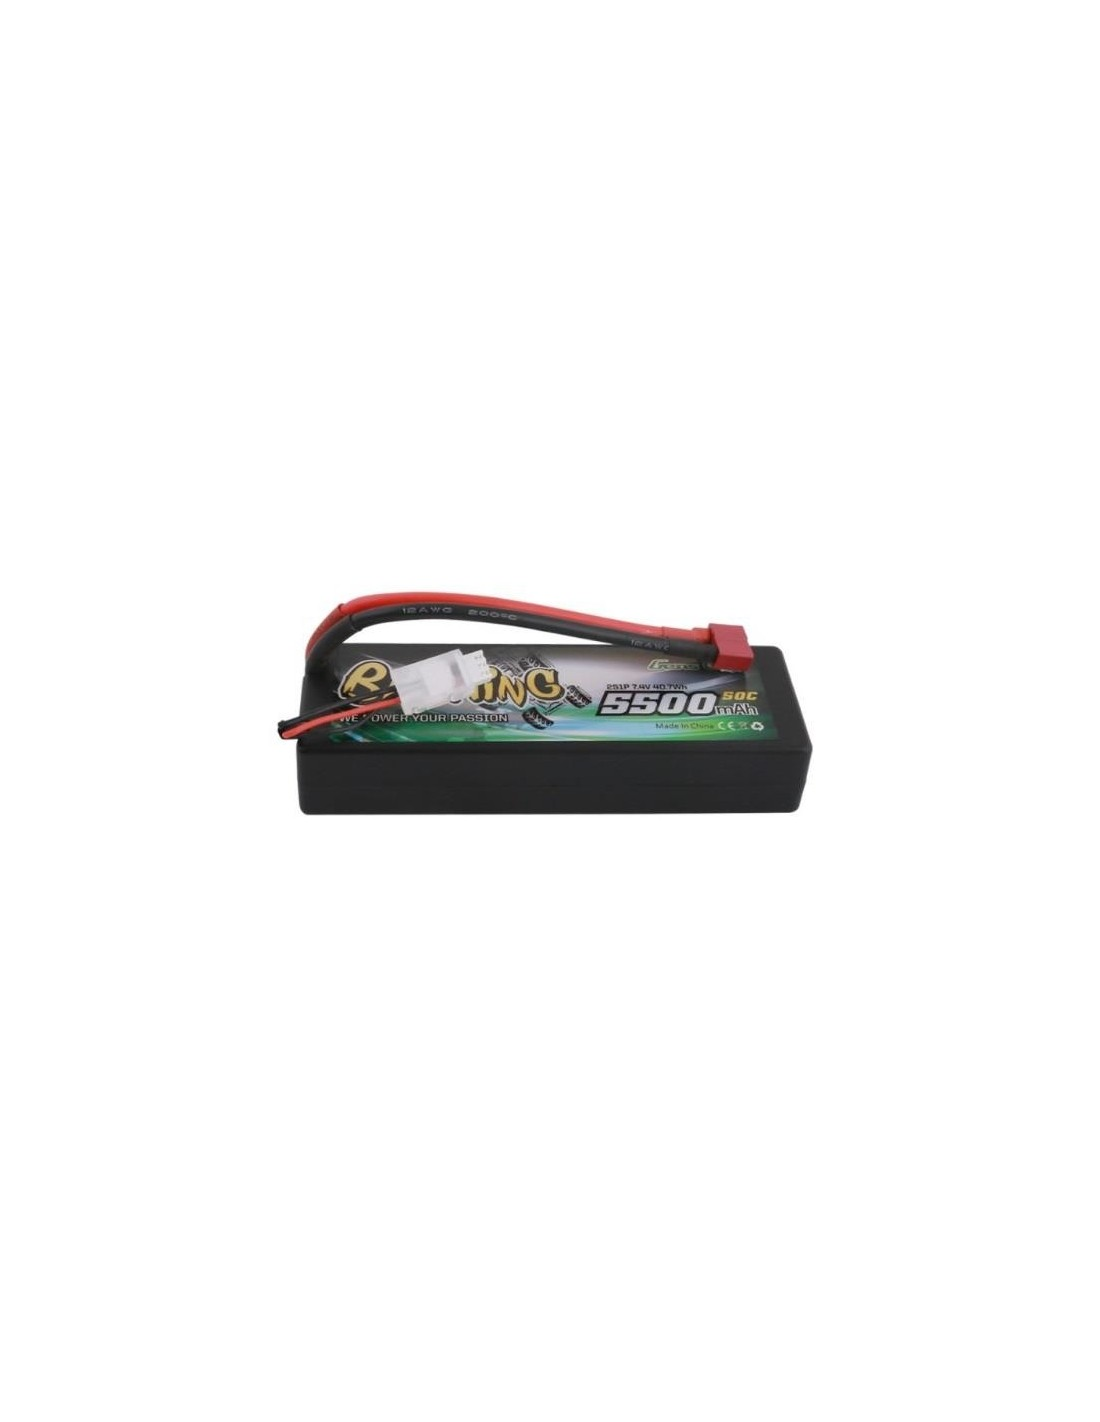 Batería LiPo GENSAce Bashing 5500mAh 7,4V 50C Hardcase